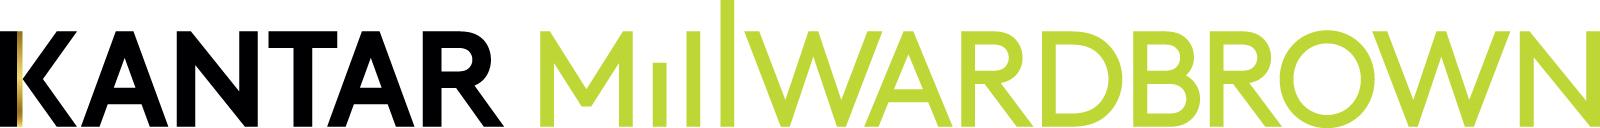 Kantar_Millwardbrown_Large_Logo_BLACK_RGB